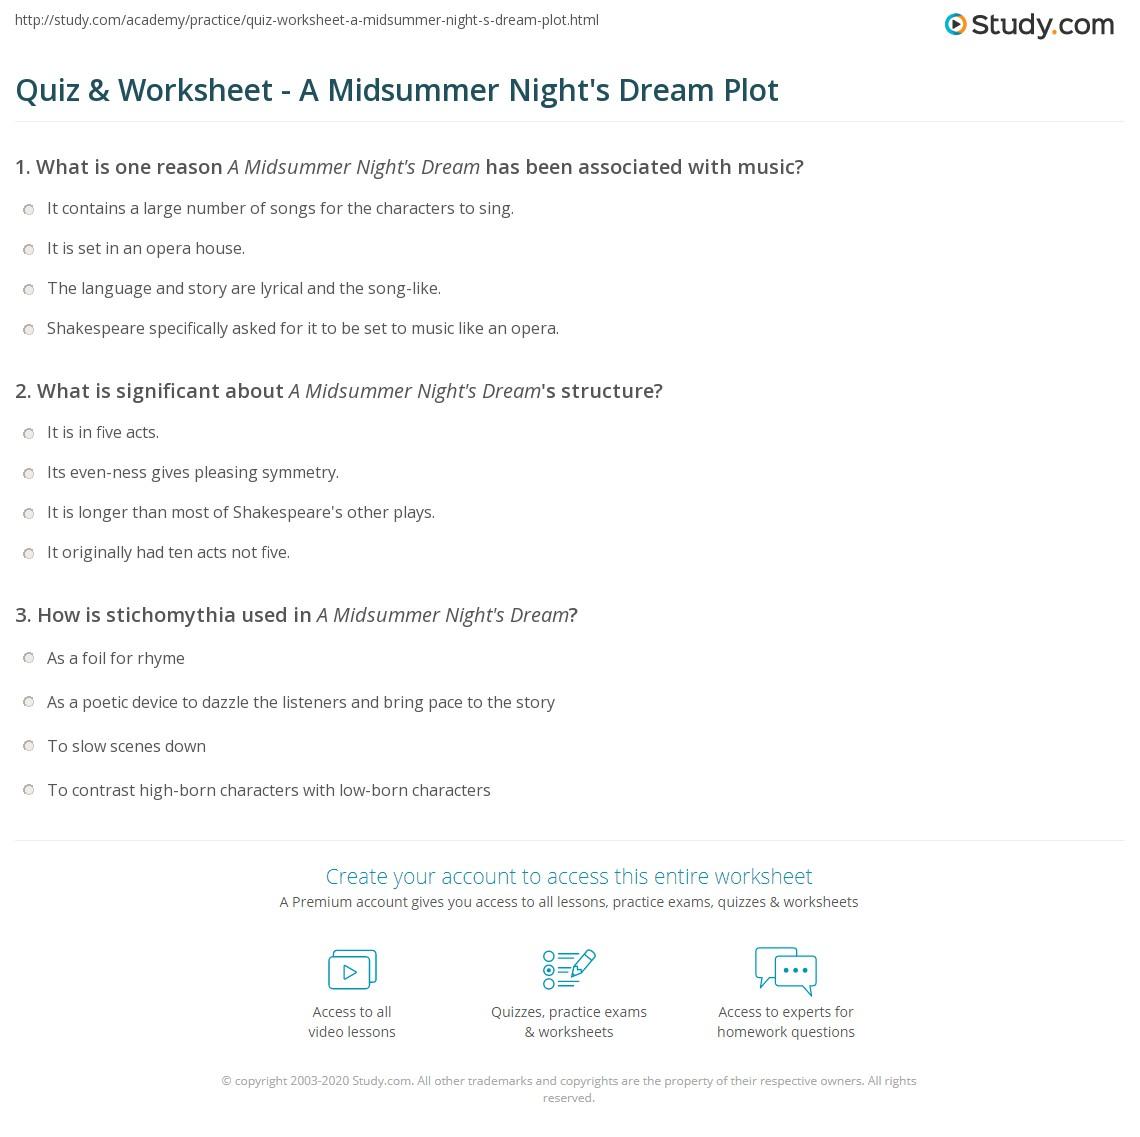 https://study.com/academy/practice/quiz-worksheet-a-midsummer-night-s-dream-plot.jpg